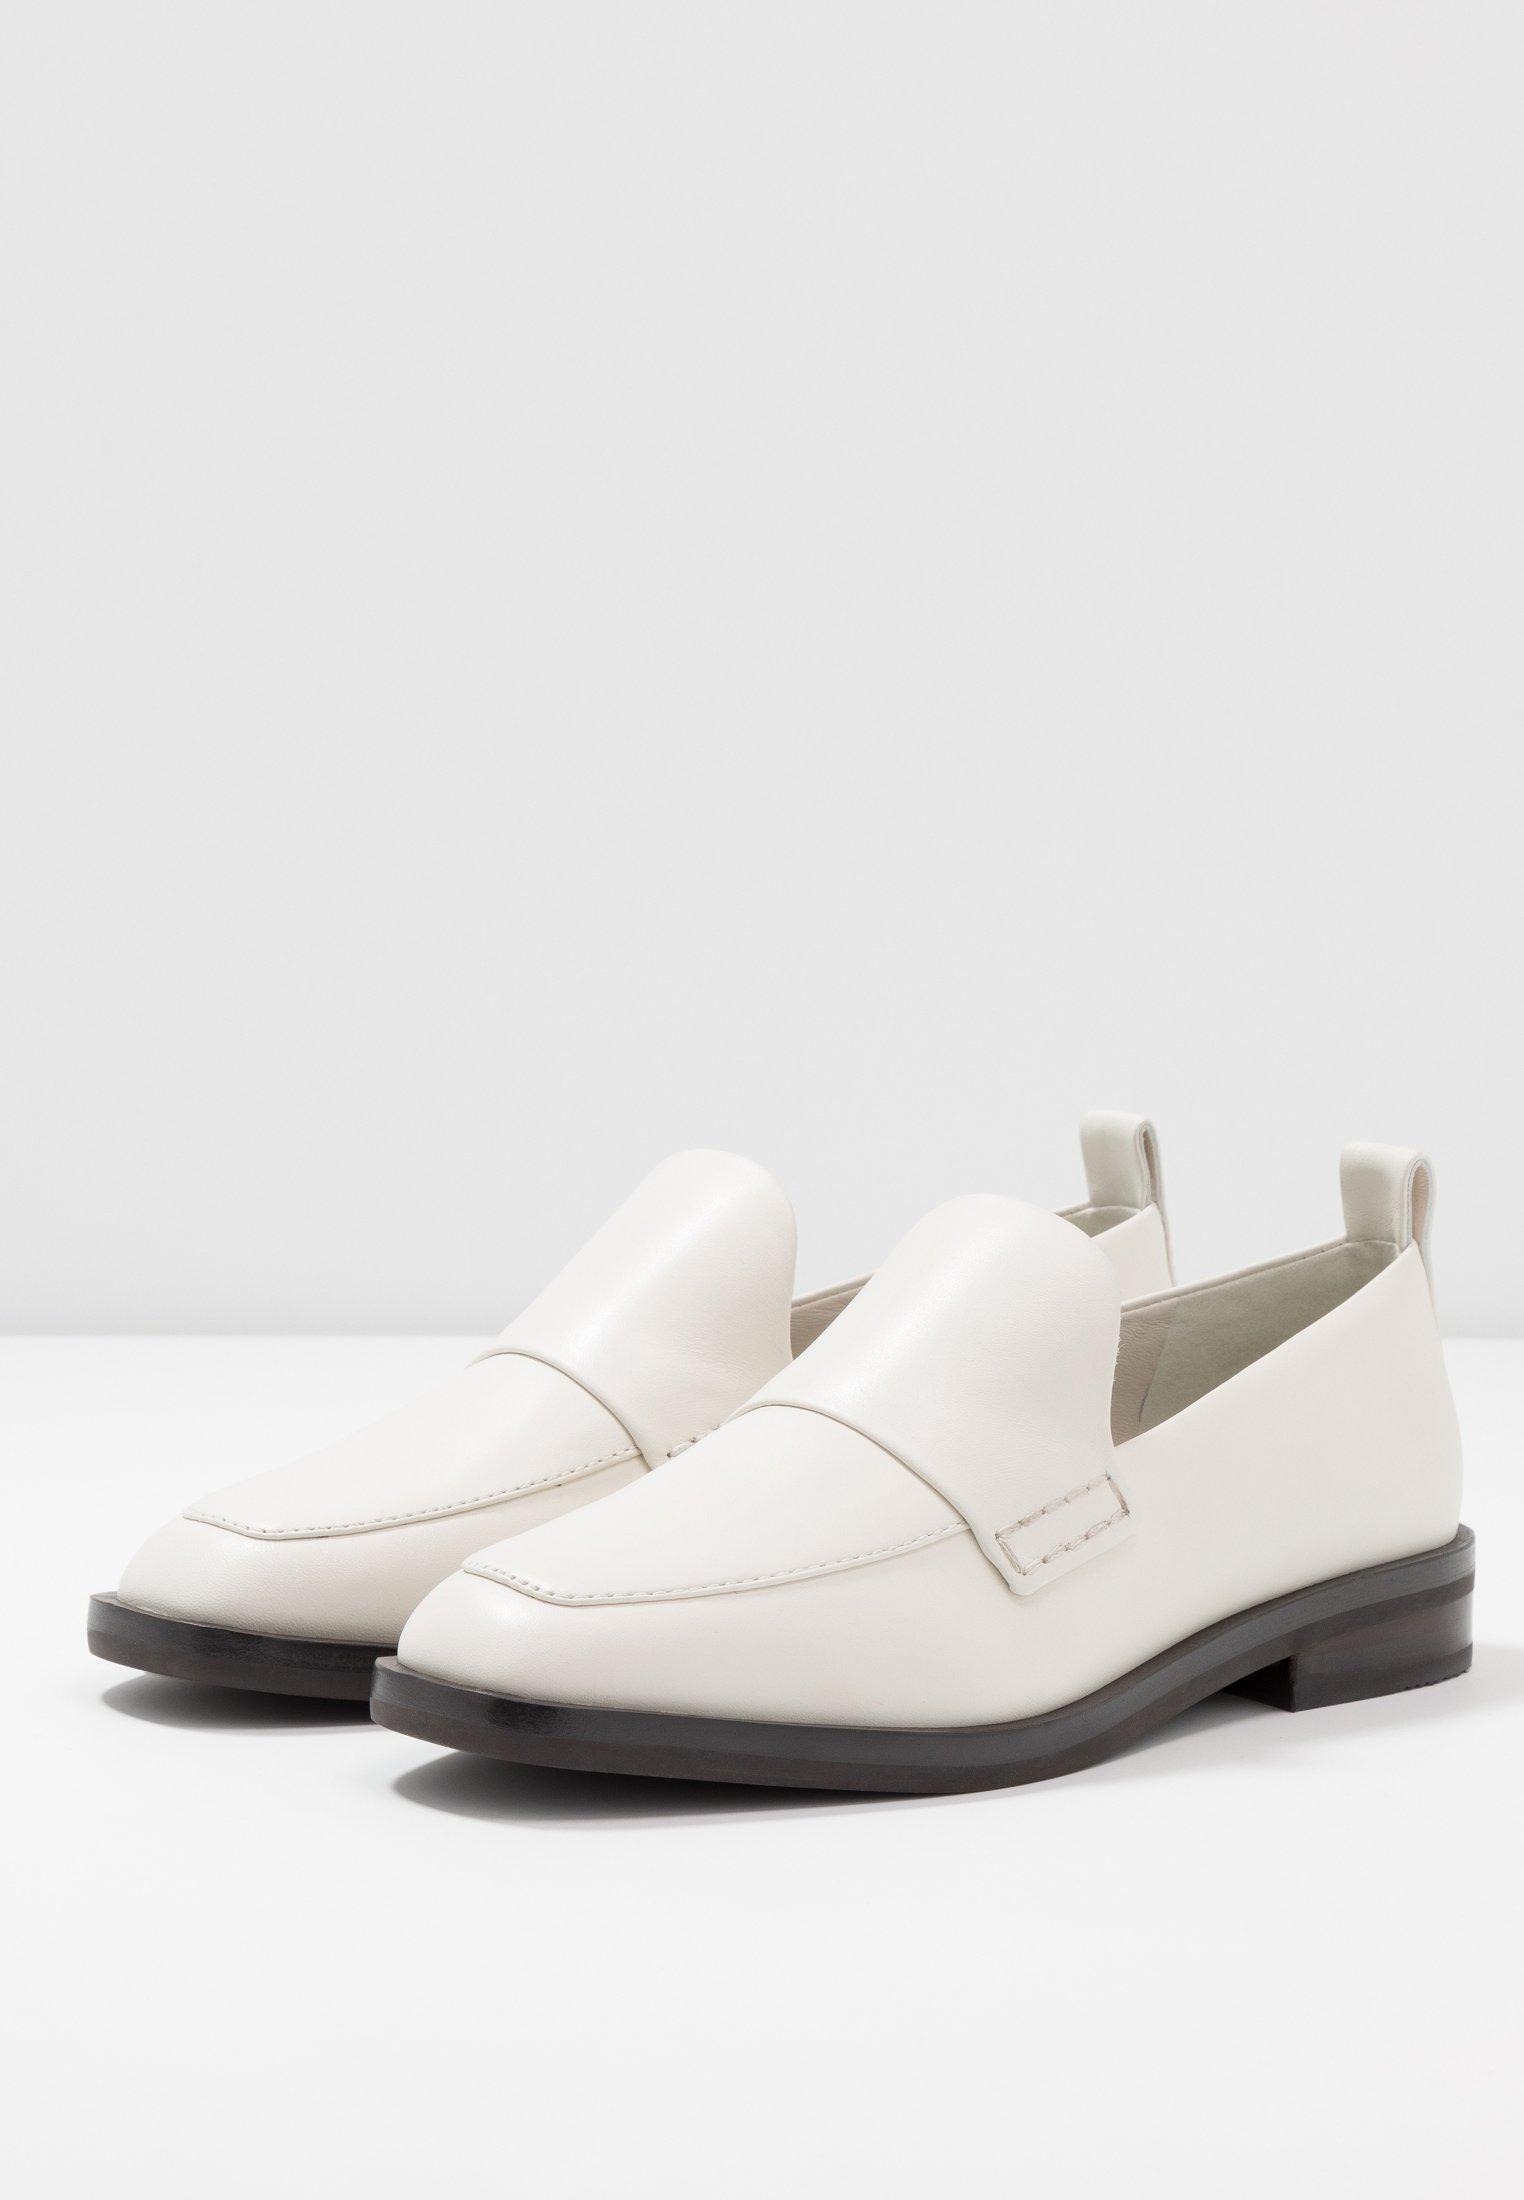 LoaferMocassins Lim Phillip Bone 3 Alexa 1 rCdtshQ